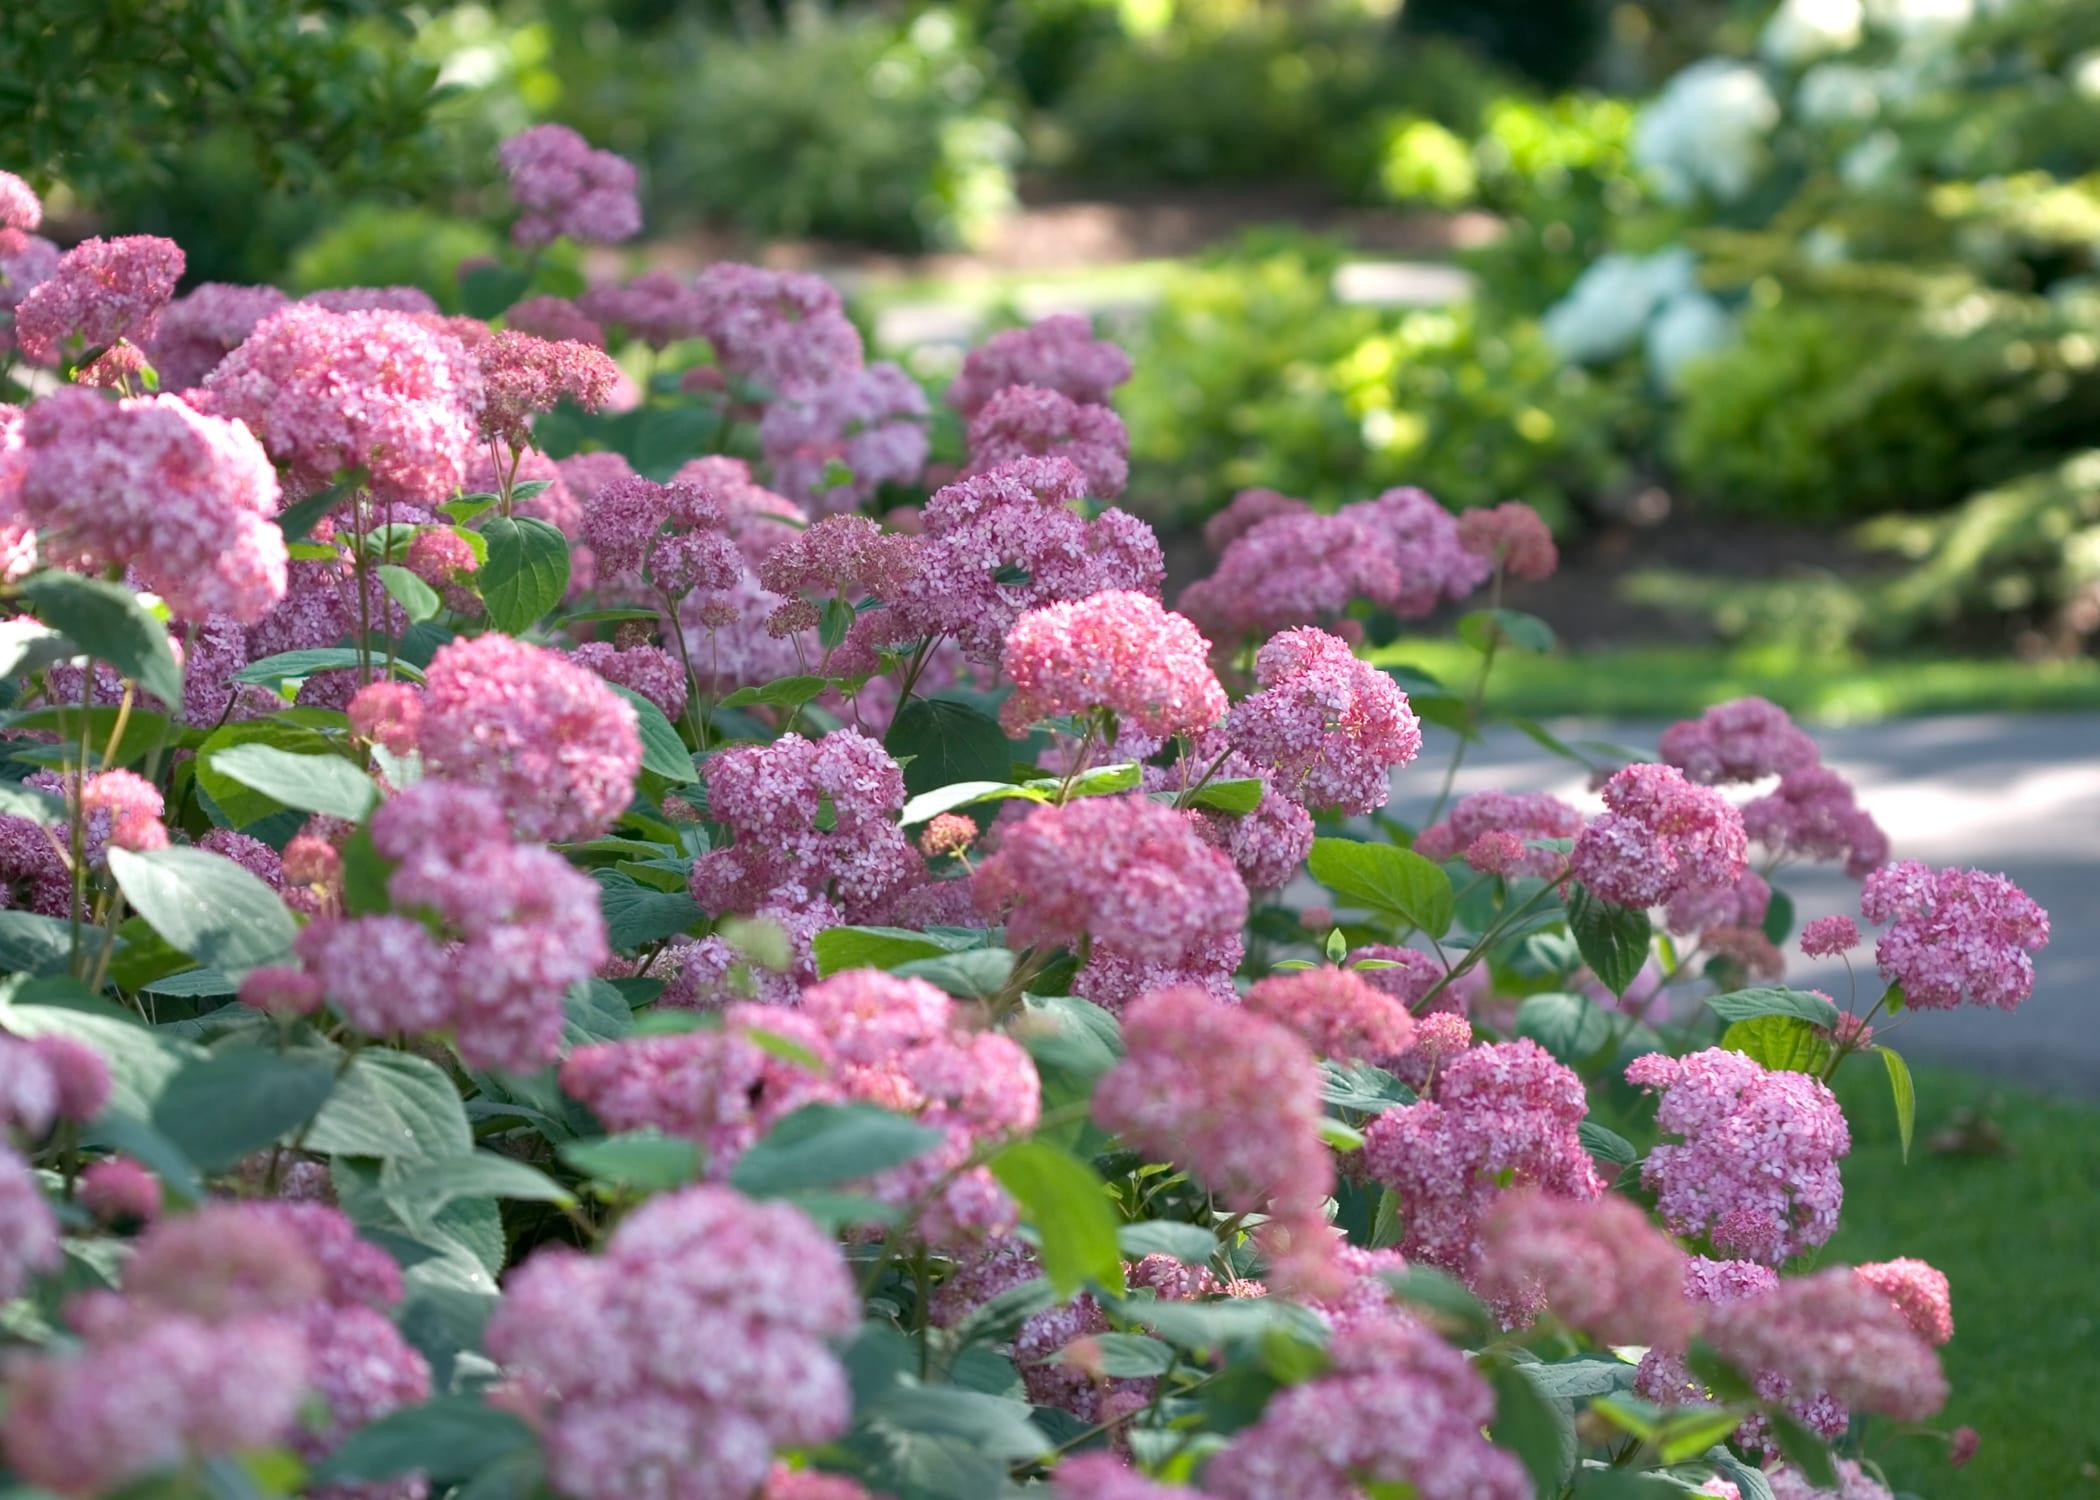 Hydrangea Arborescens \'Pink Annabelle\' | Jos Kolster - Boomkwekerij